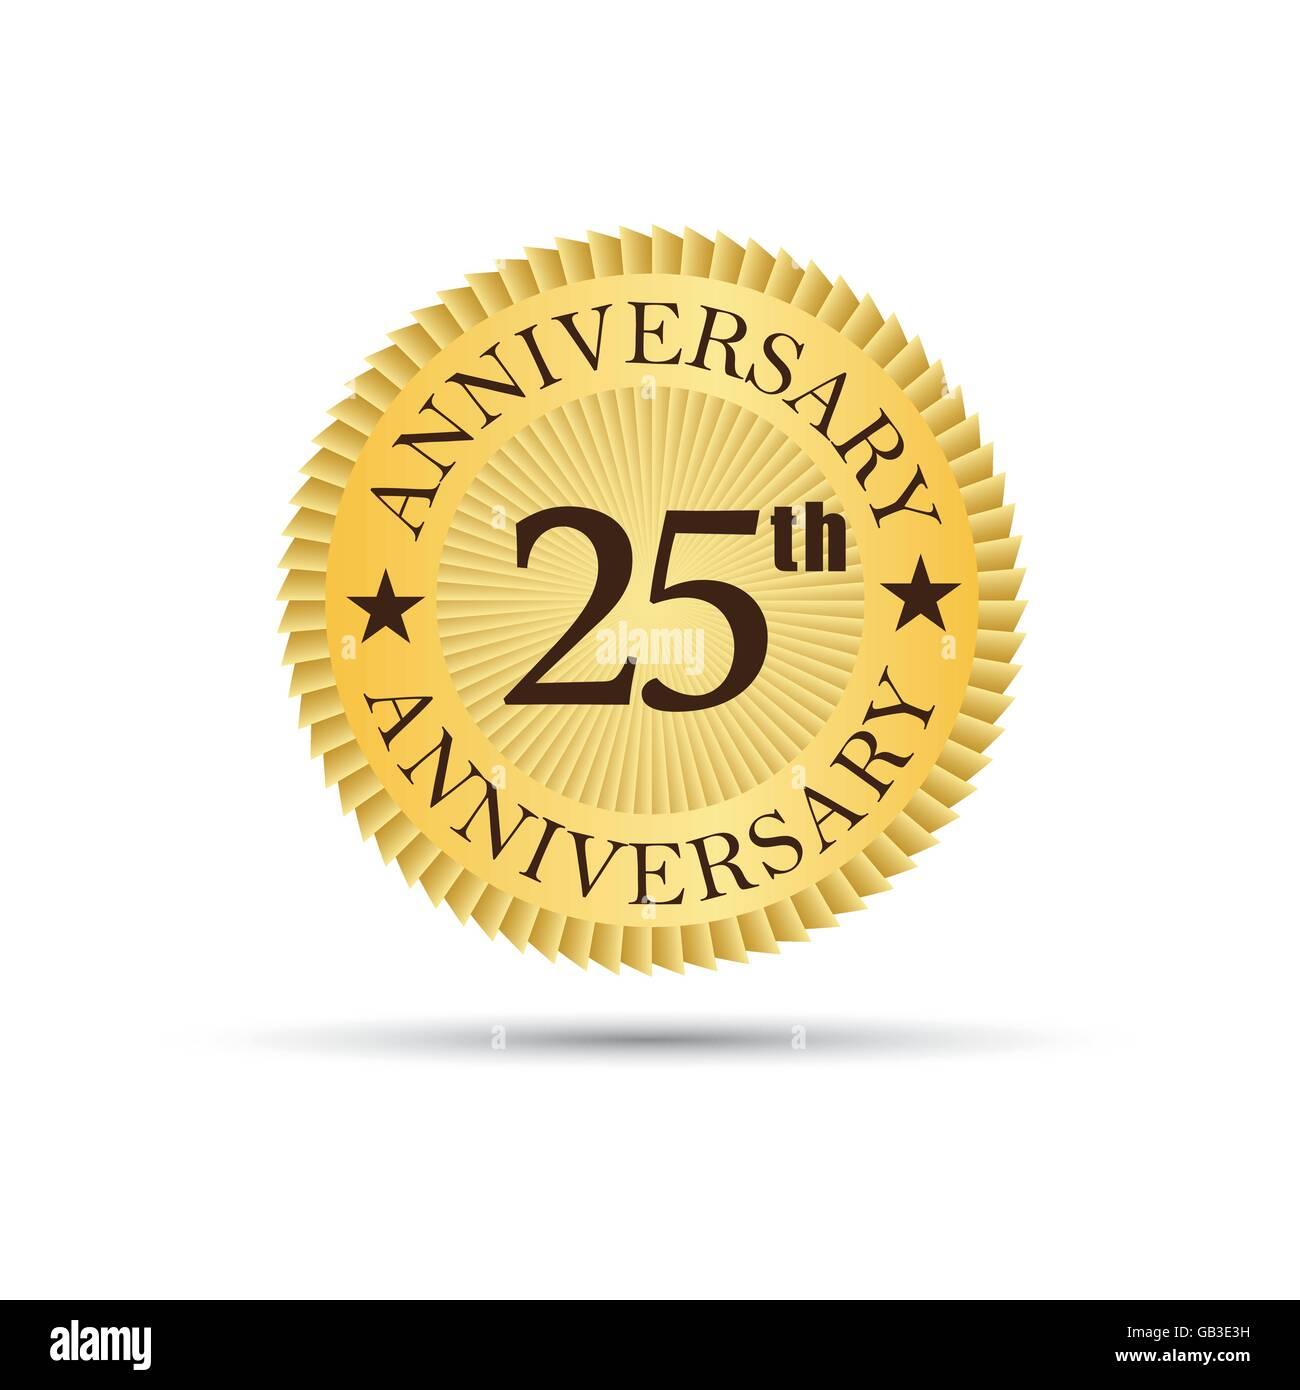 Golden label badge 25 years anniversary logo - Stock Image